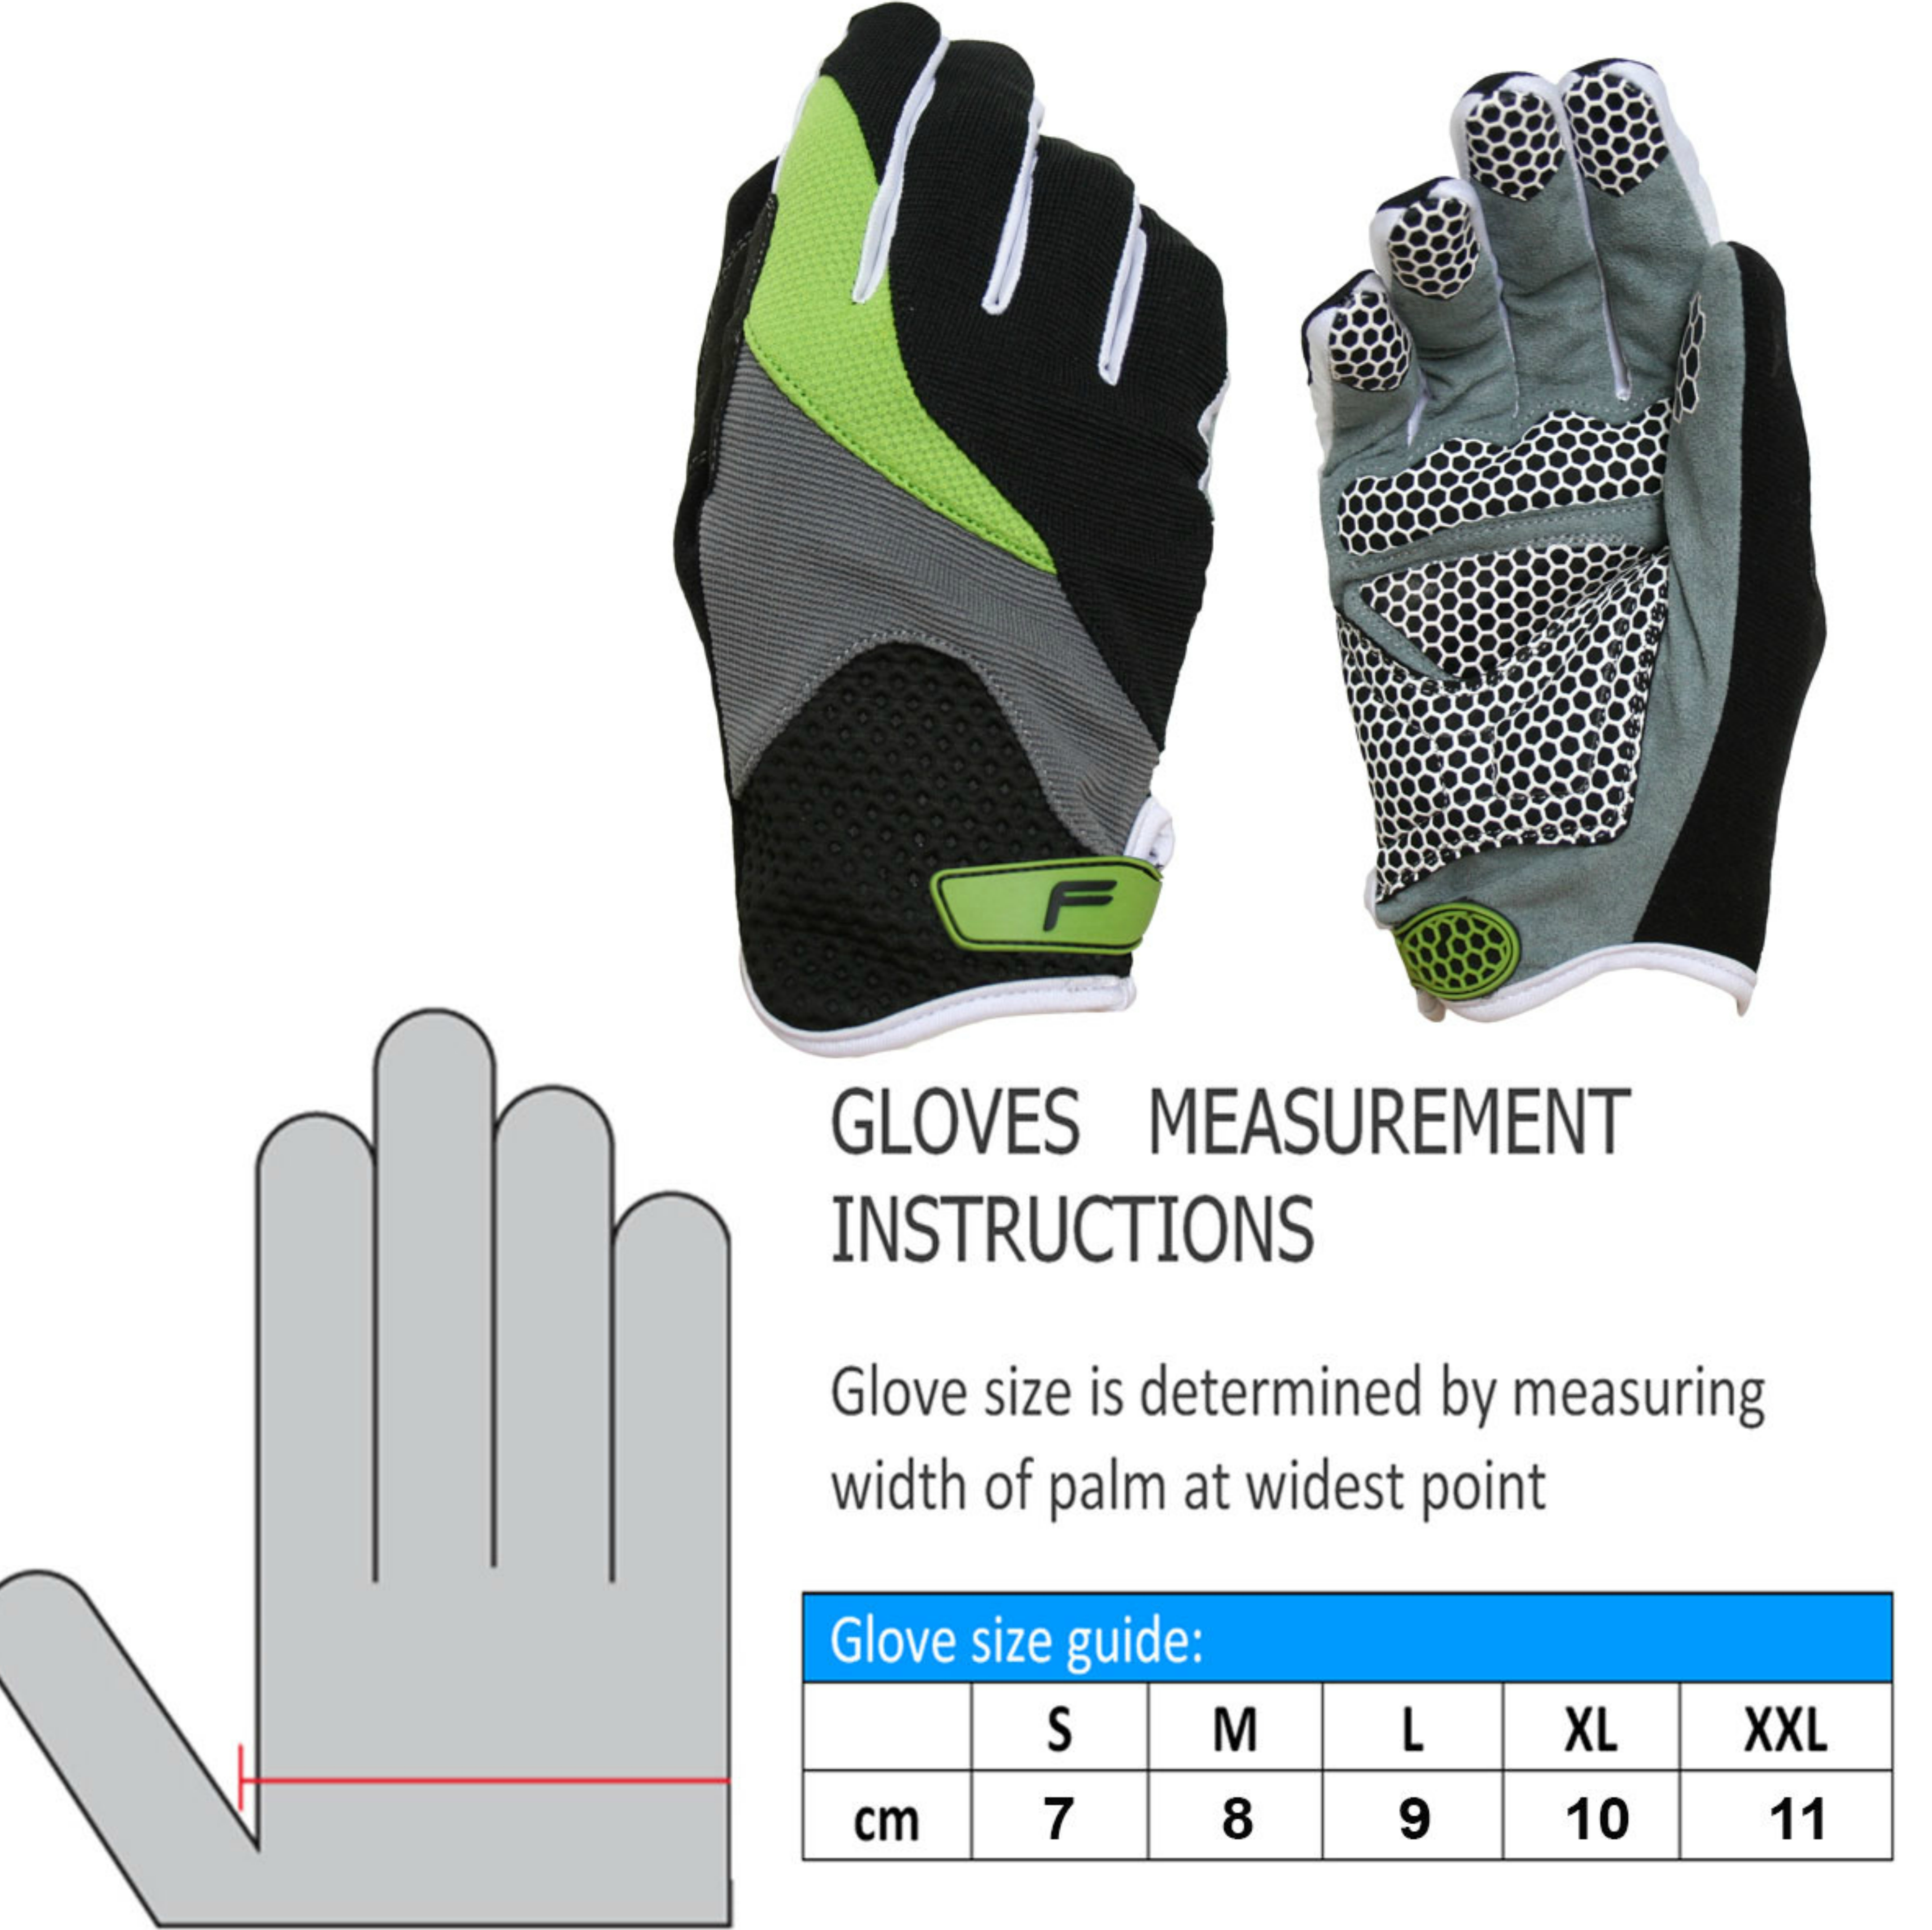 F-Lite Zenmaster Fullfinger Bike Gloves?Silicone Print?Soft Textile?Flexible